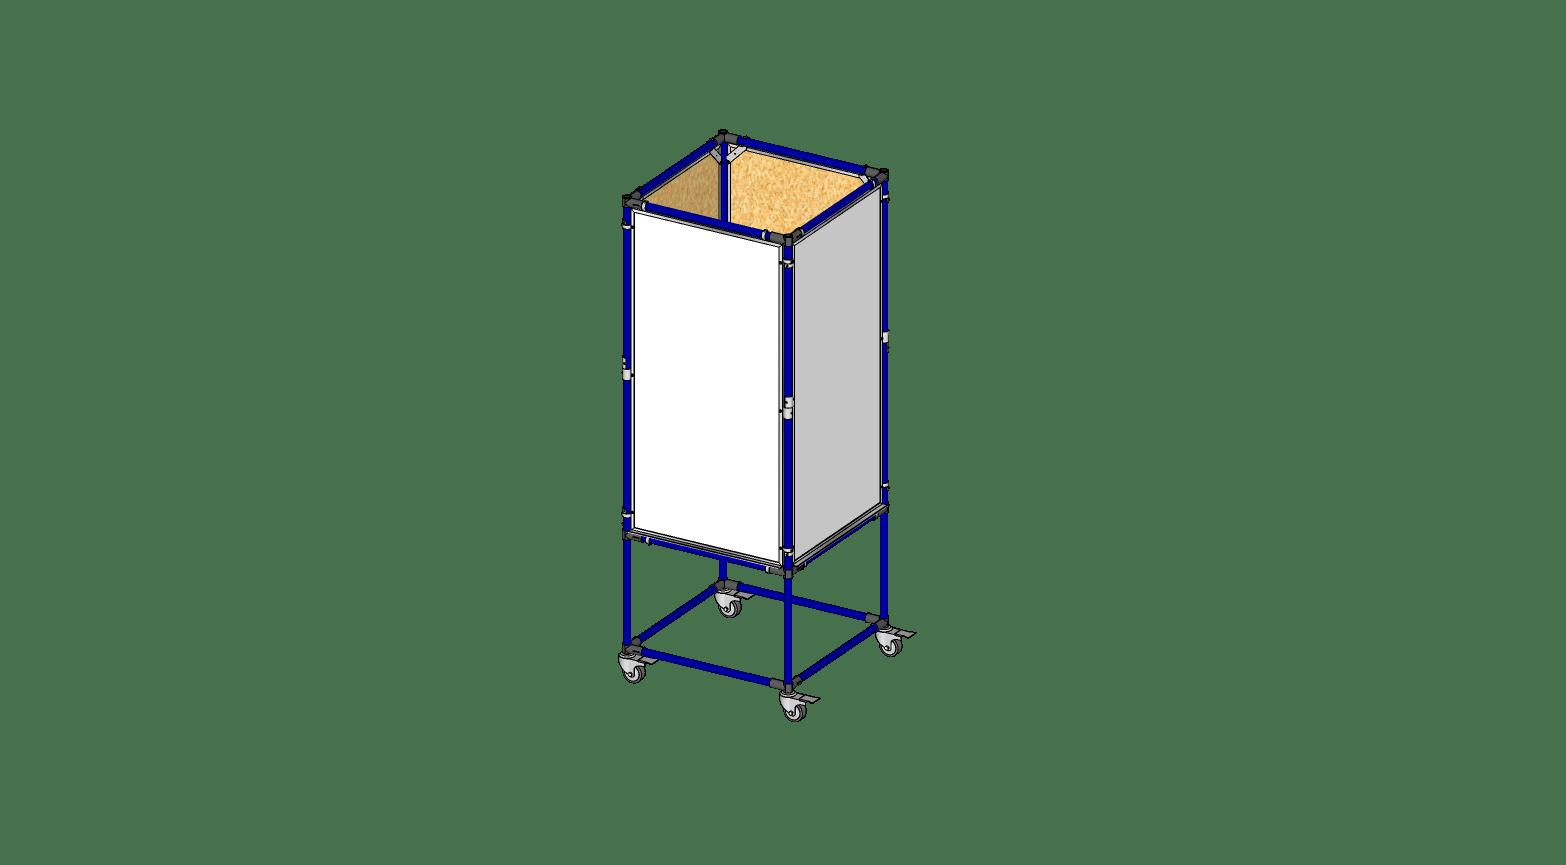 4 Sided 2' x 4' Whiteboard